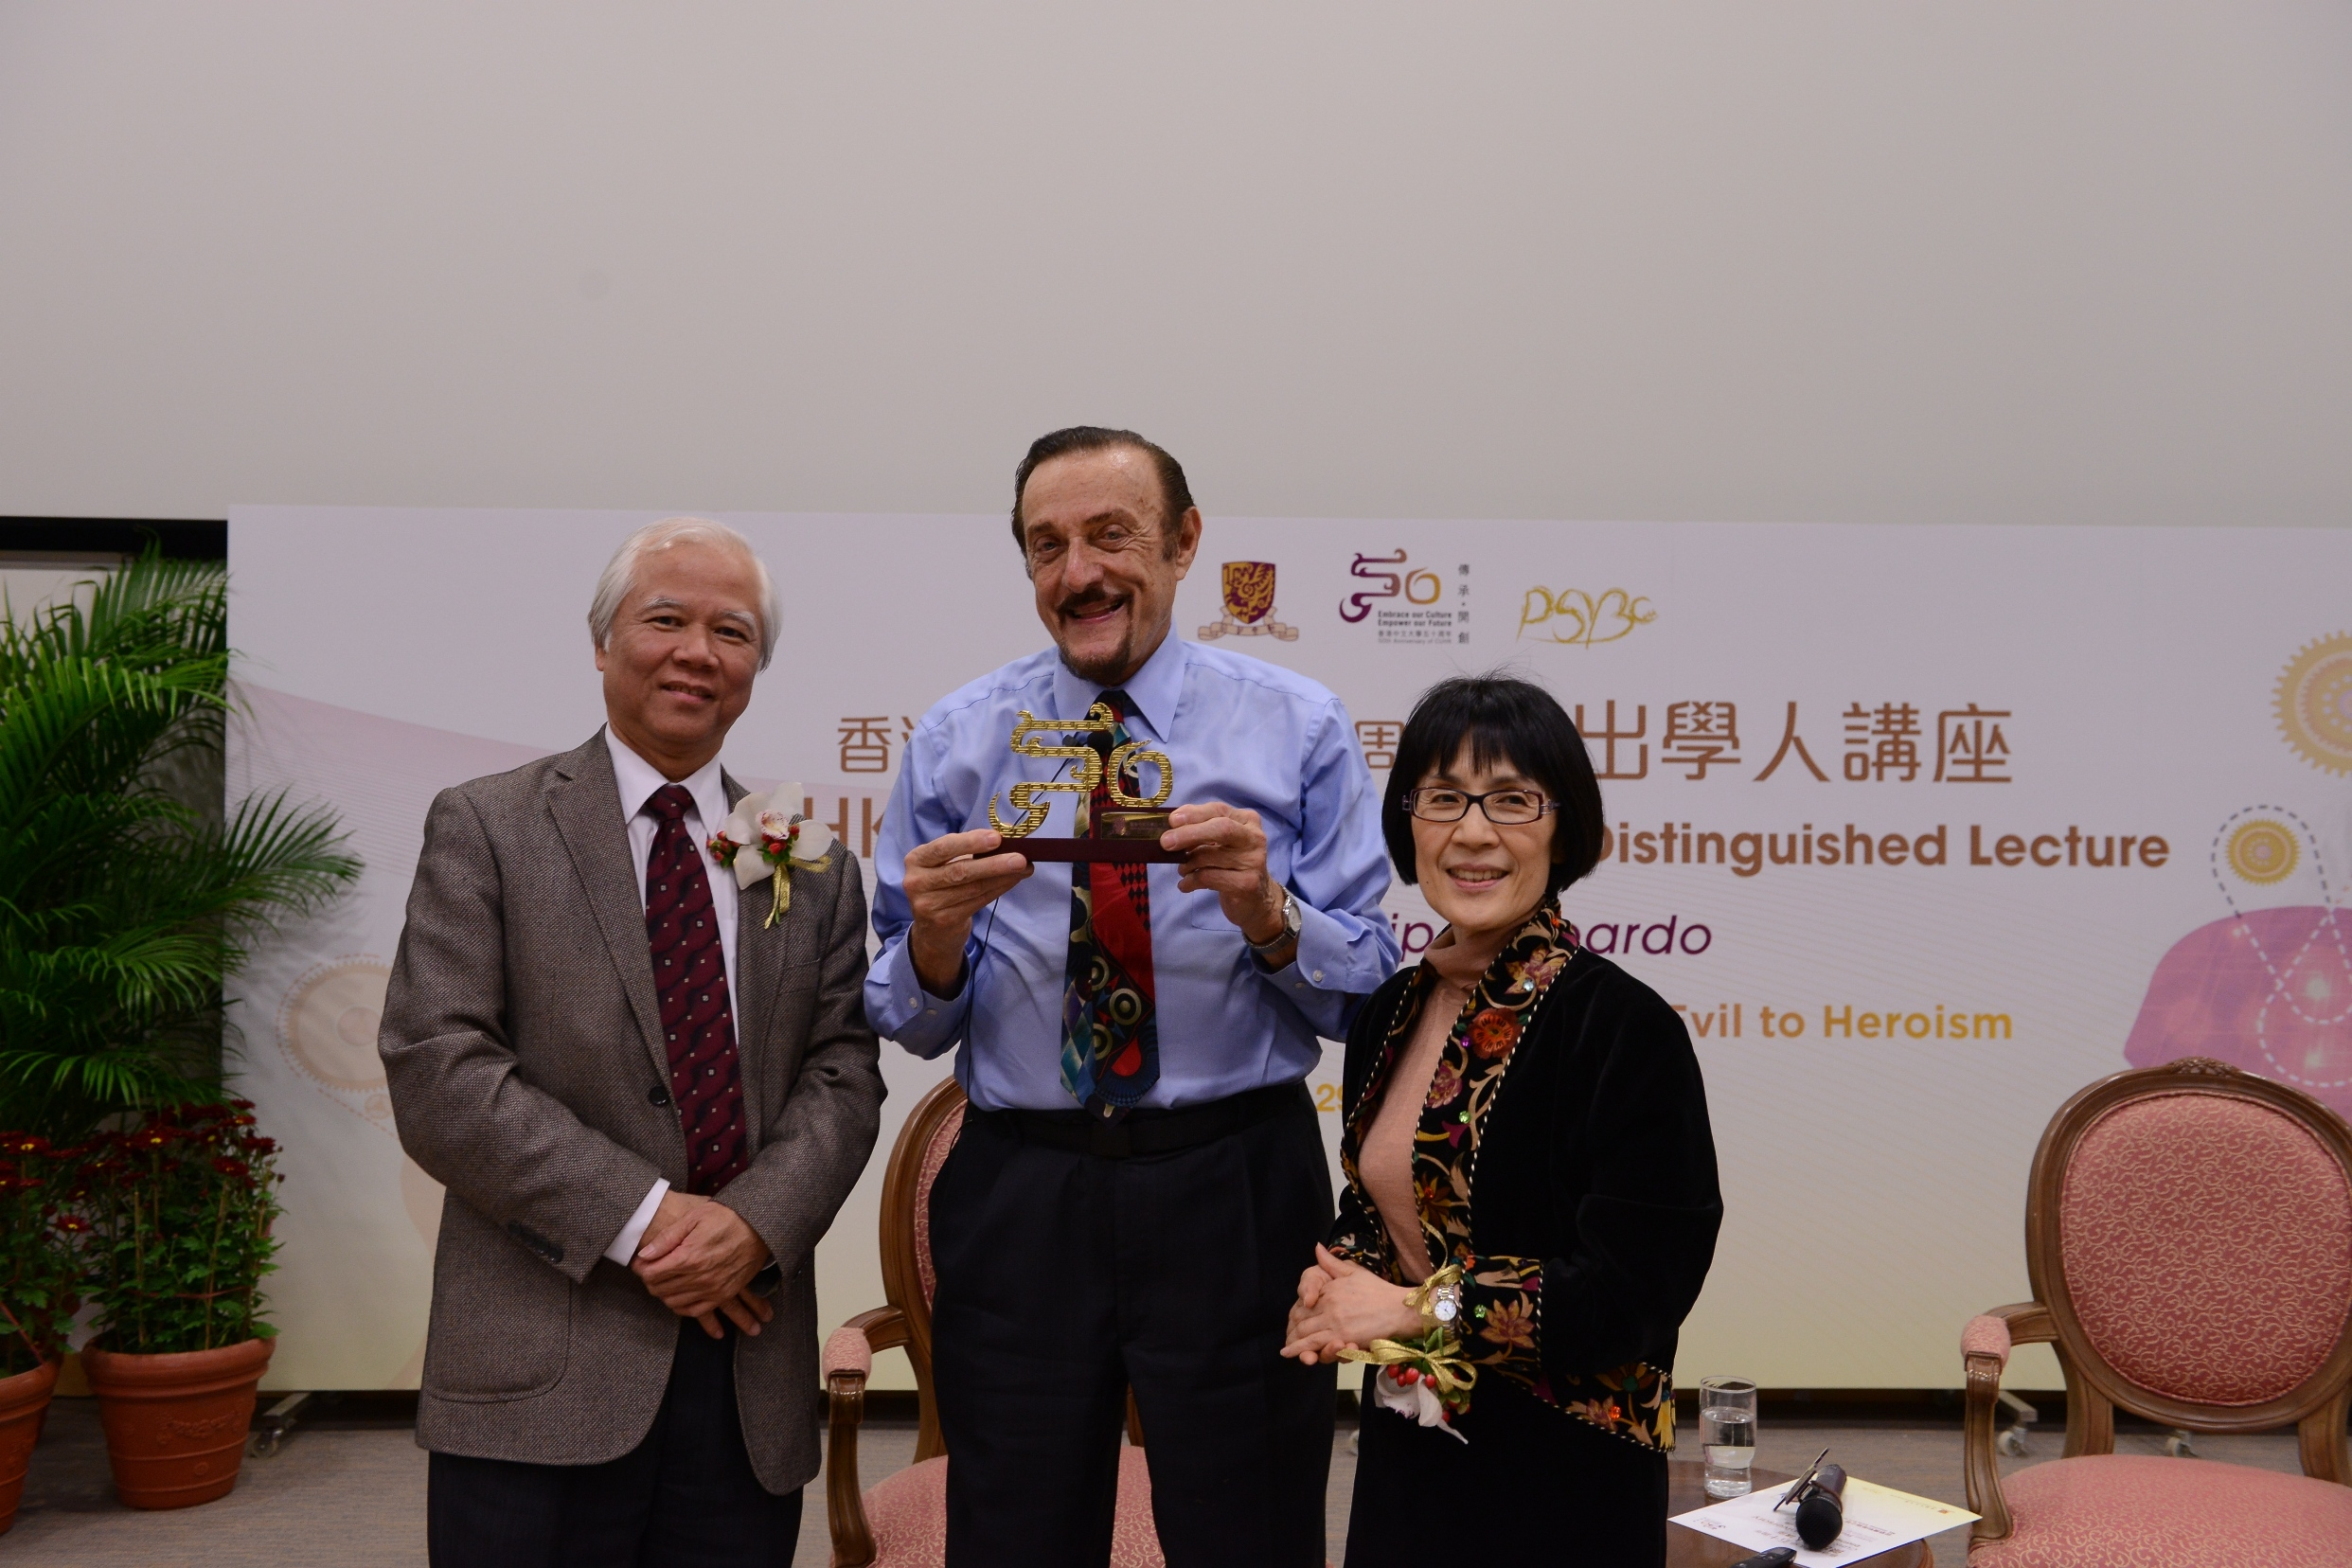 Prof. Paul Lee, Dean of Social Science (left) and Prof. Fanny Cheung, Choh-Ming Li Professor of Psychology, CUHK (right) present a souvenir to Prof. Philip Zimbardo.